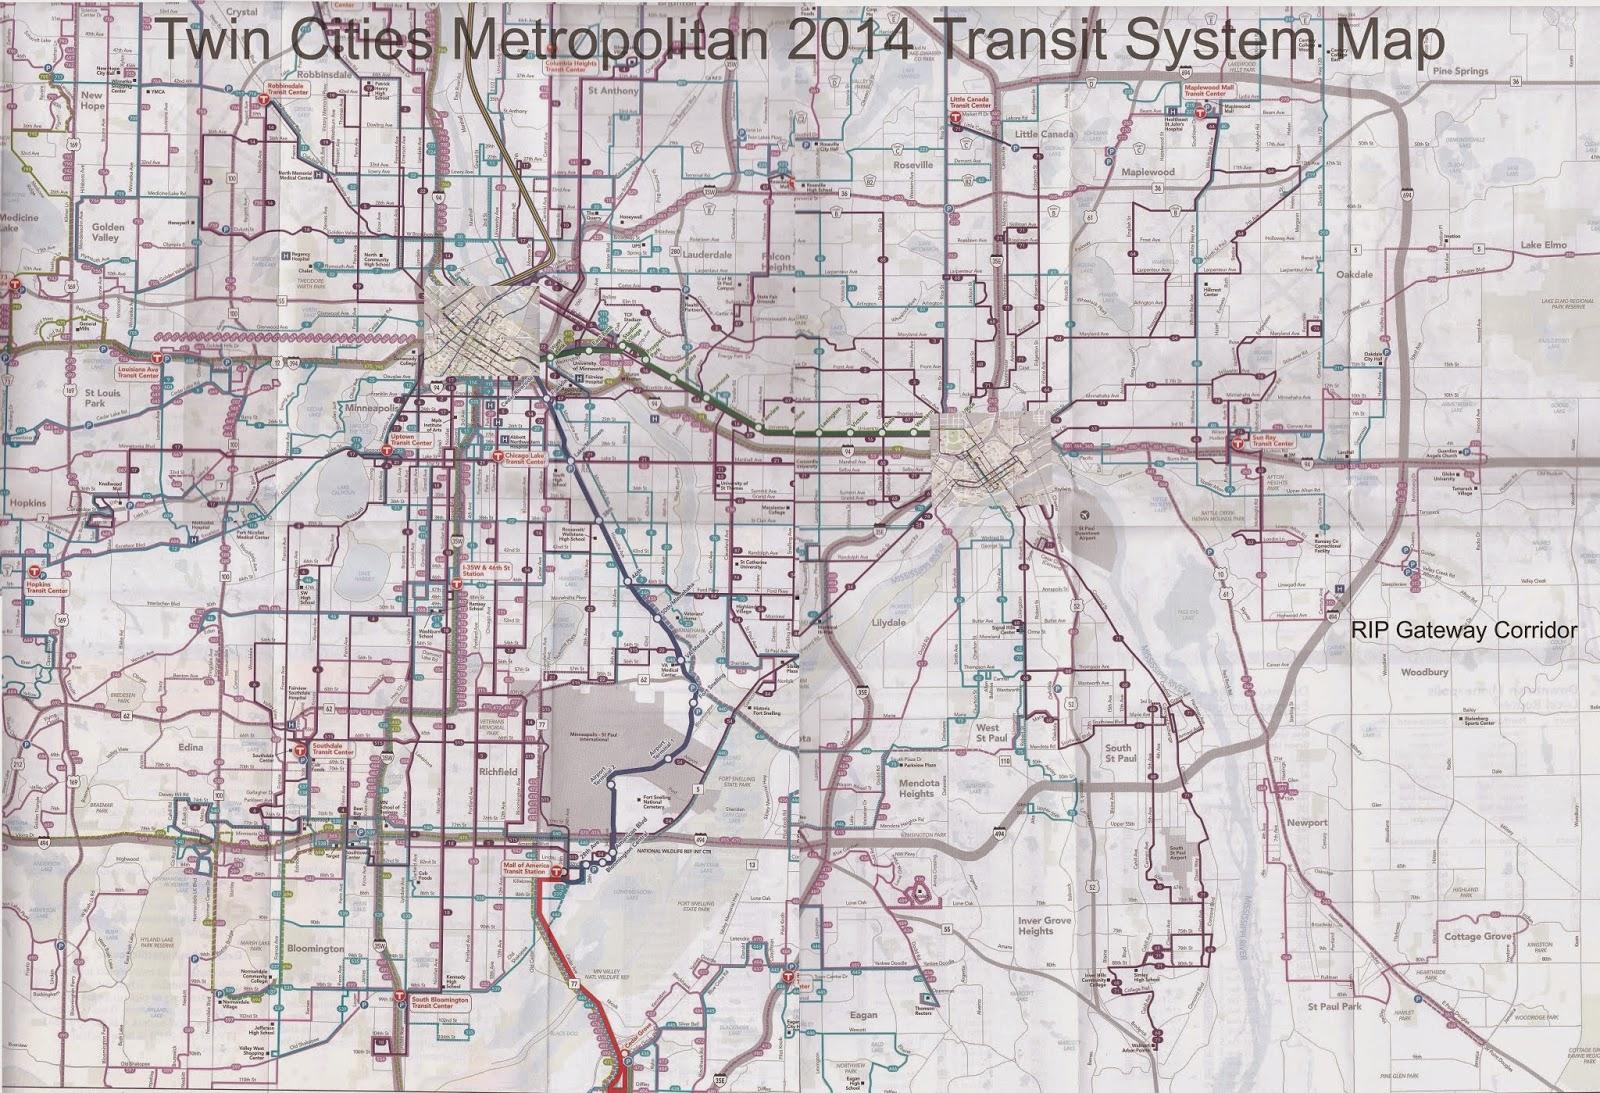 Twin Cities Metropolitan Area Transit System Map 2014